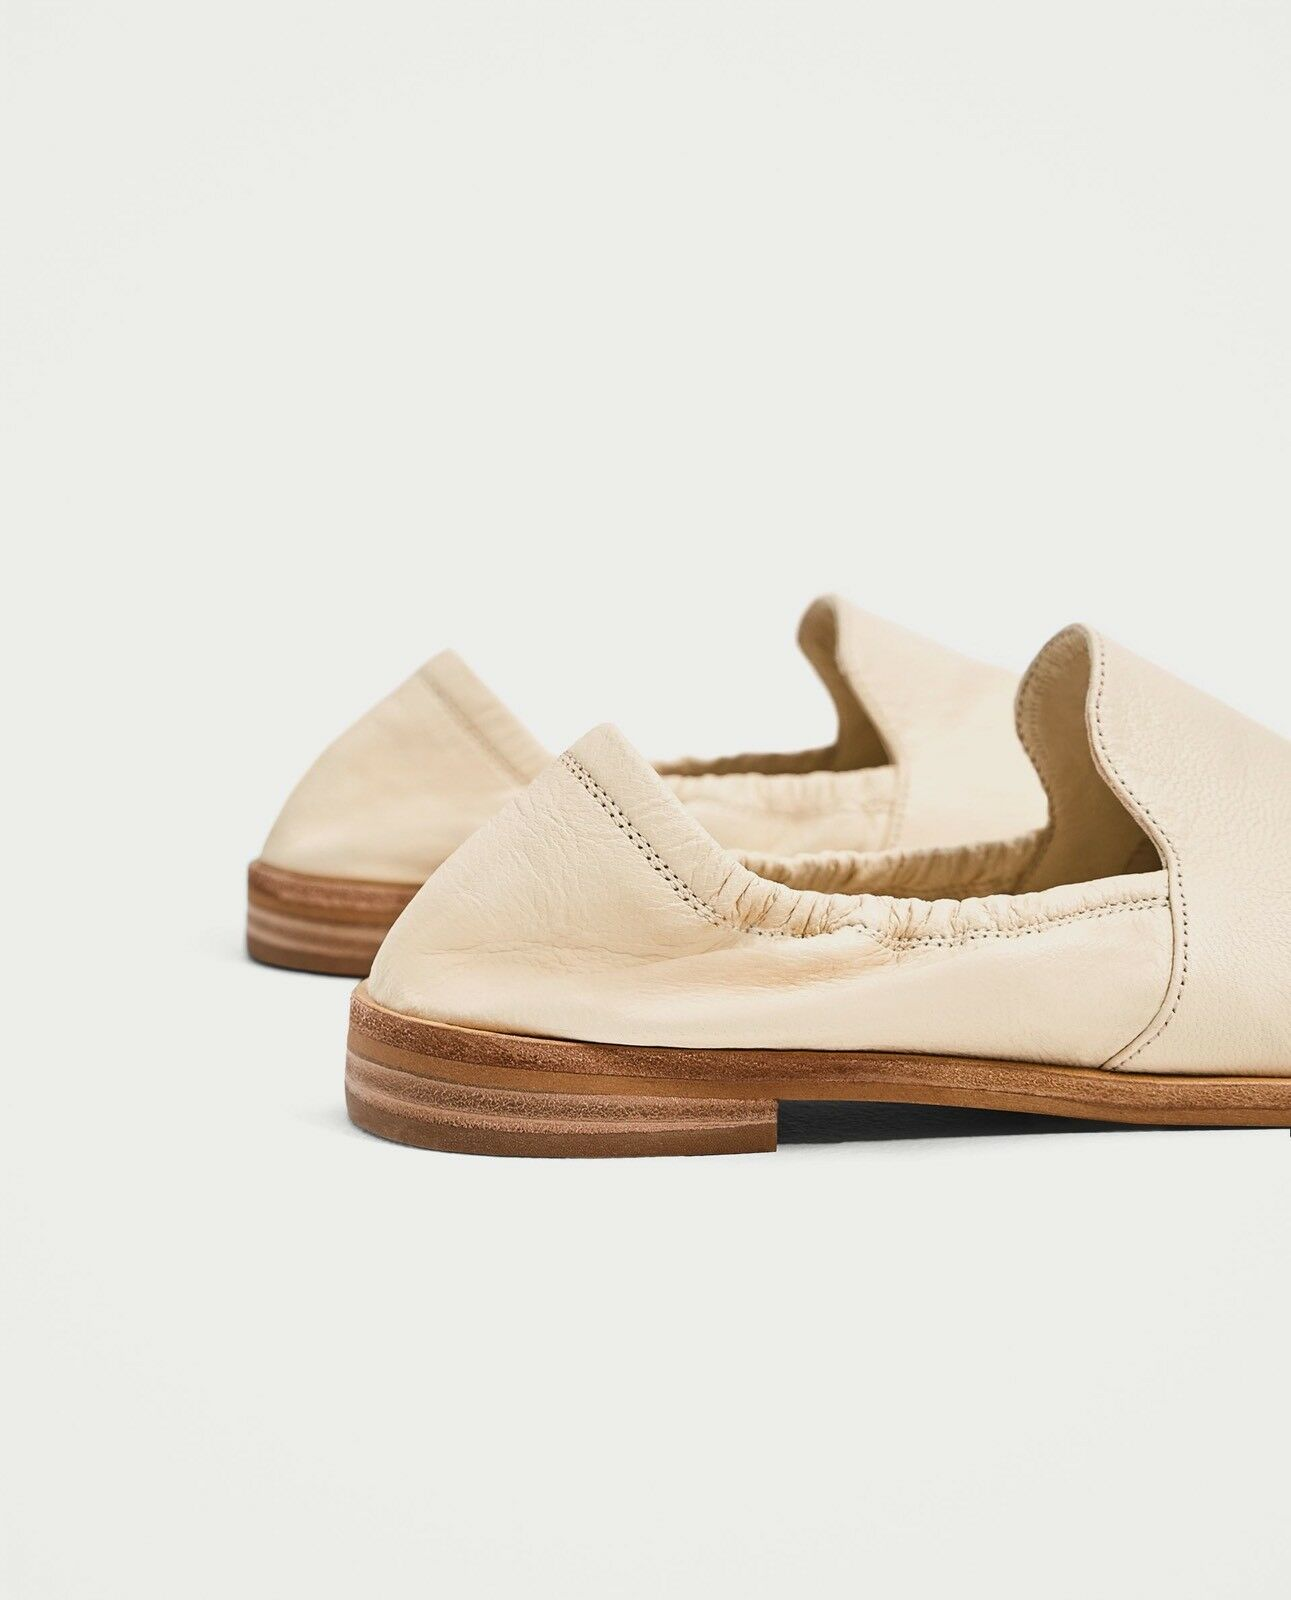 Zara Damens Soft Leder slippers 5303/201 Größe 6.5 EUR 37 NWT